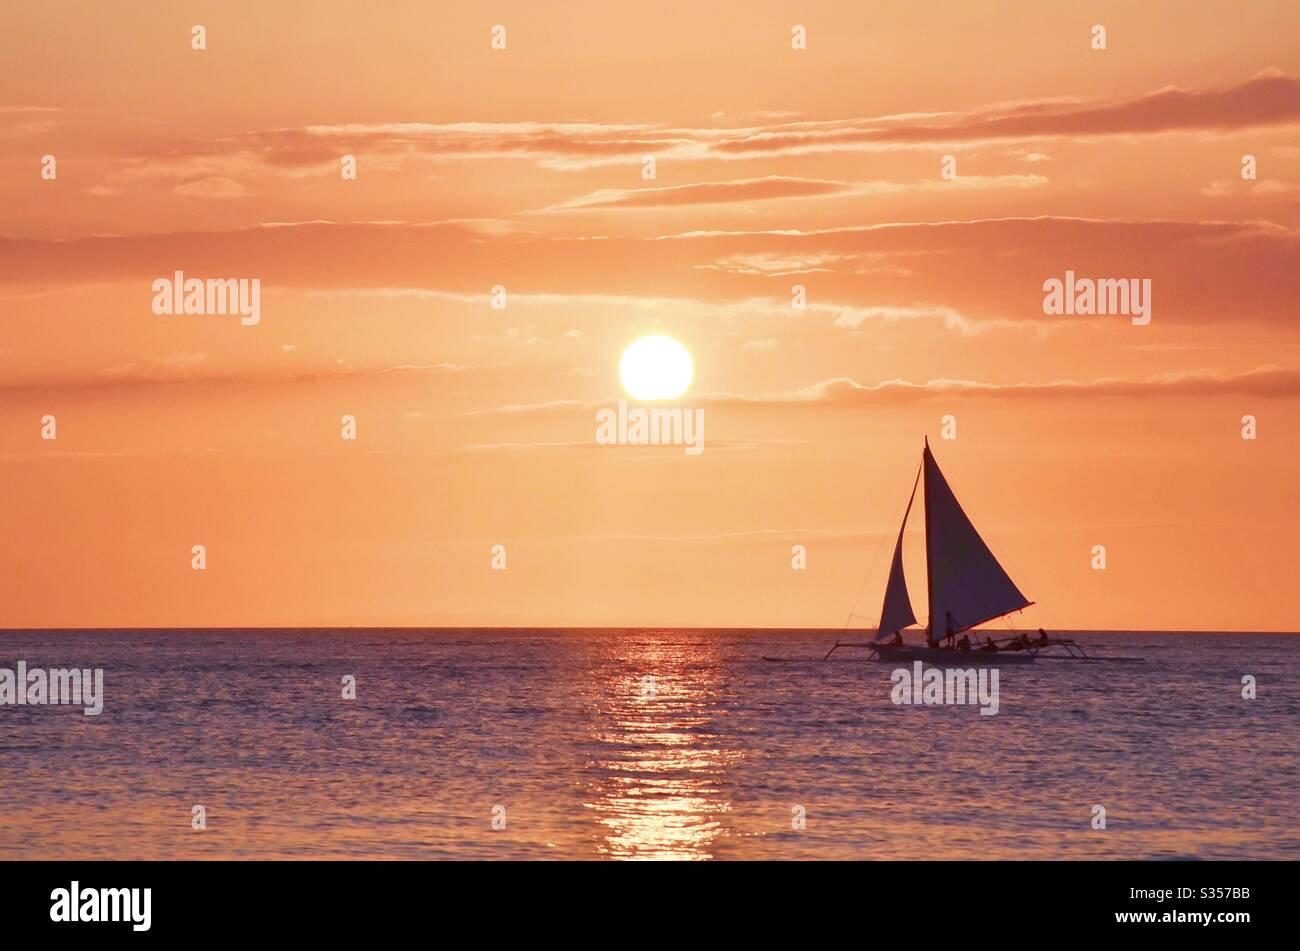 Sonnenuntergang segeln Stockfoto